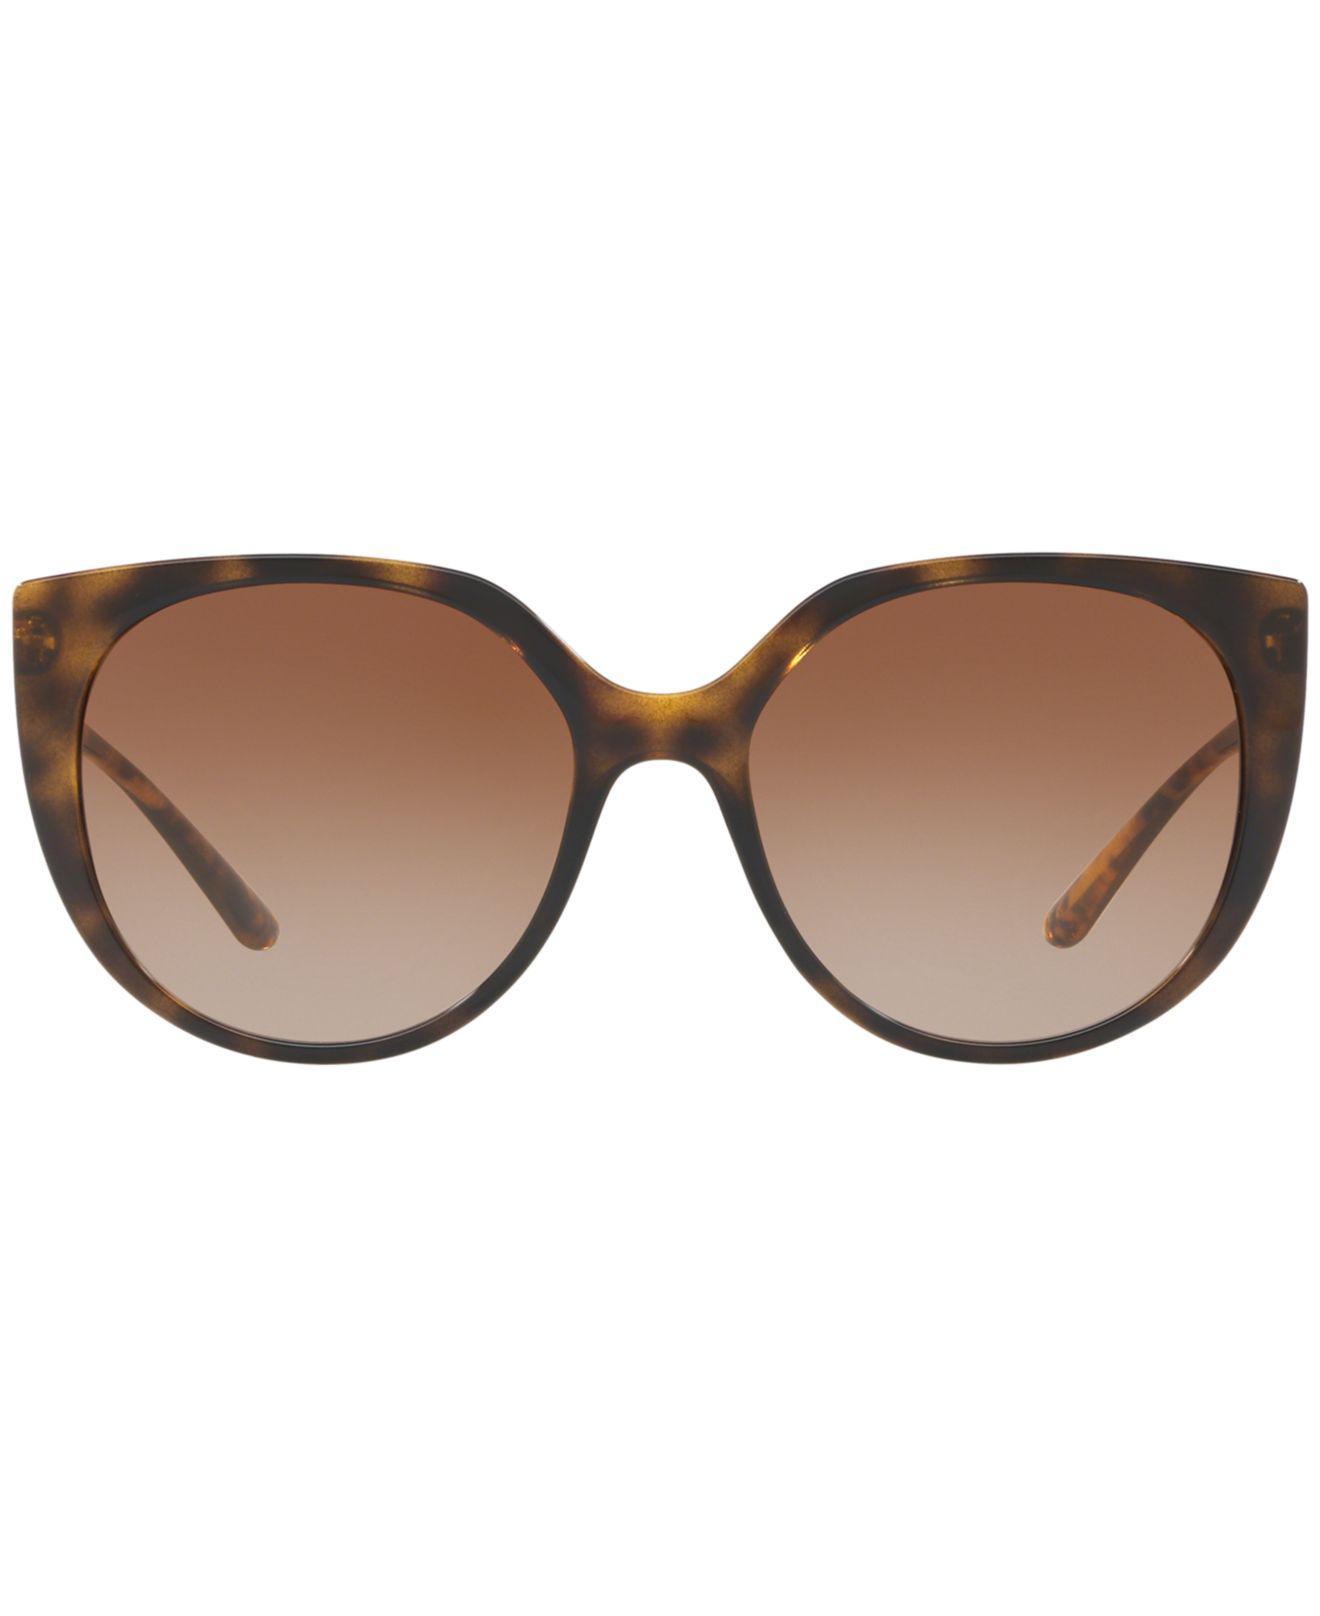 28e9a4f45cd Lyst - Dolce   Gabbana Sunglasses